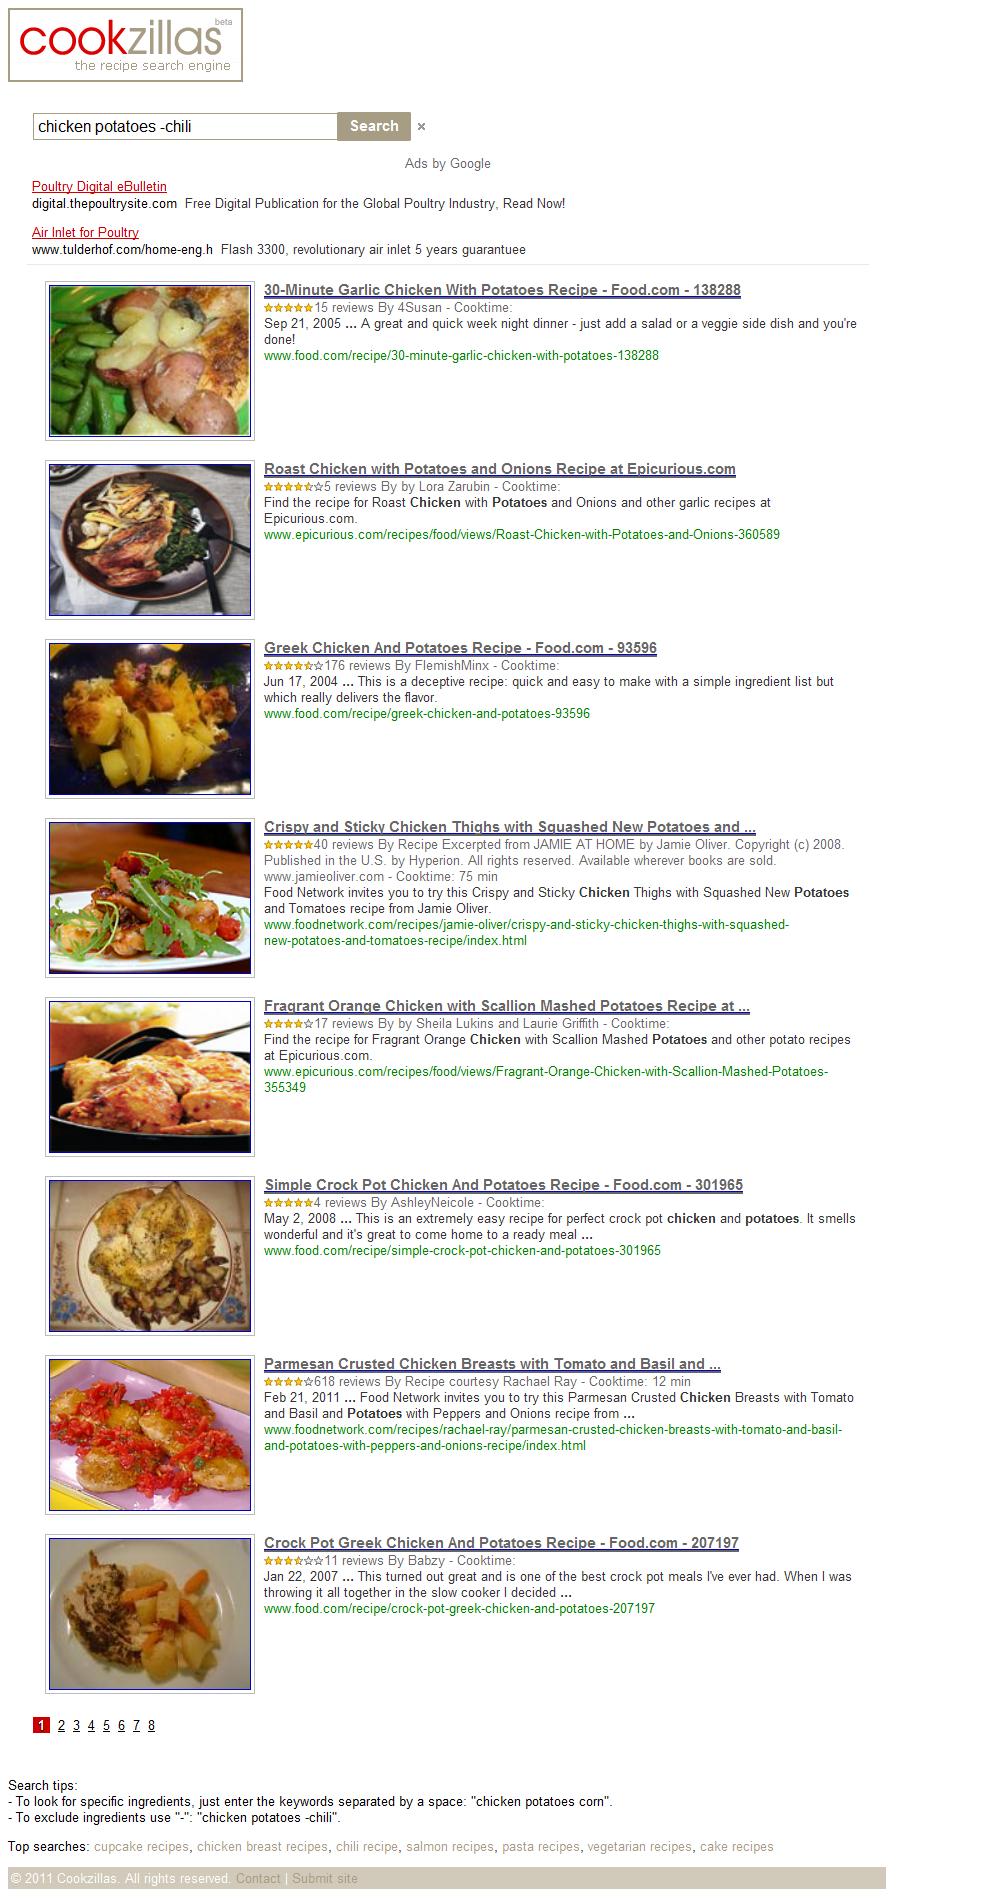 Cookzillas | un motor de búsquedas para recetas